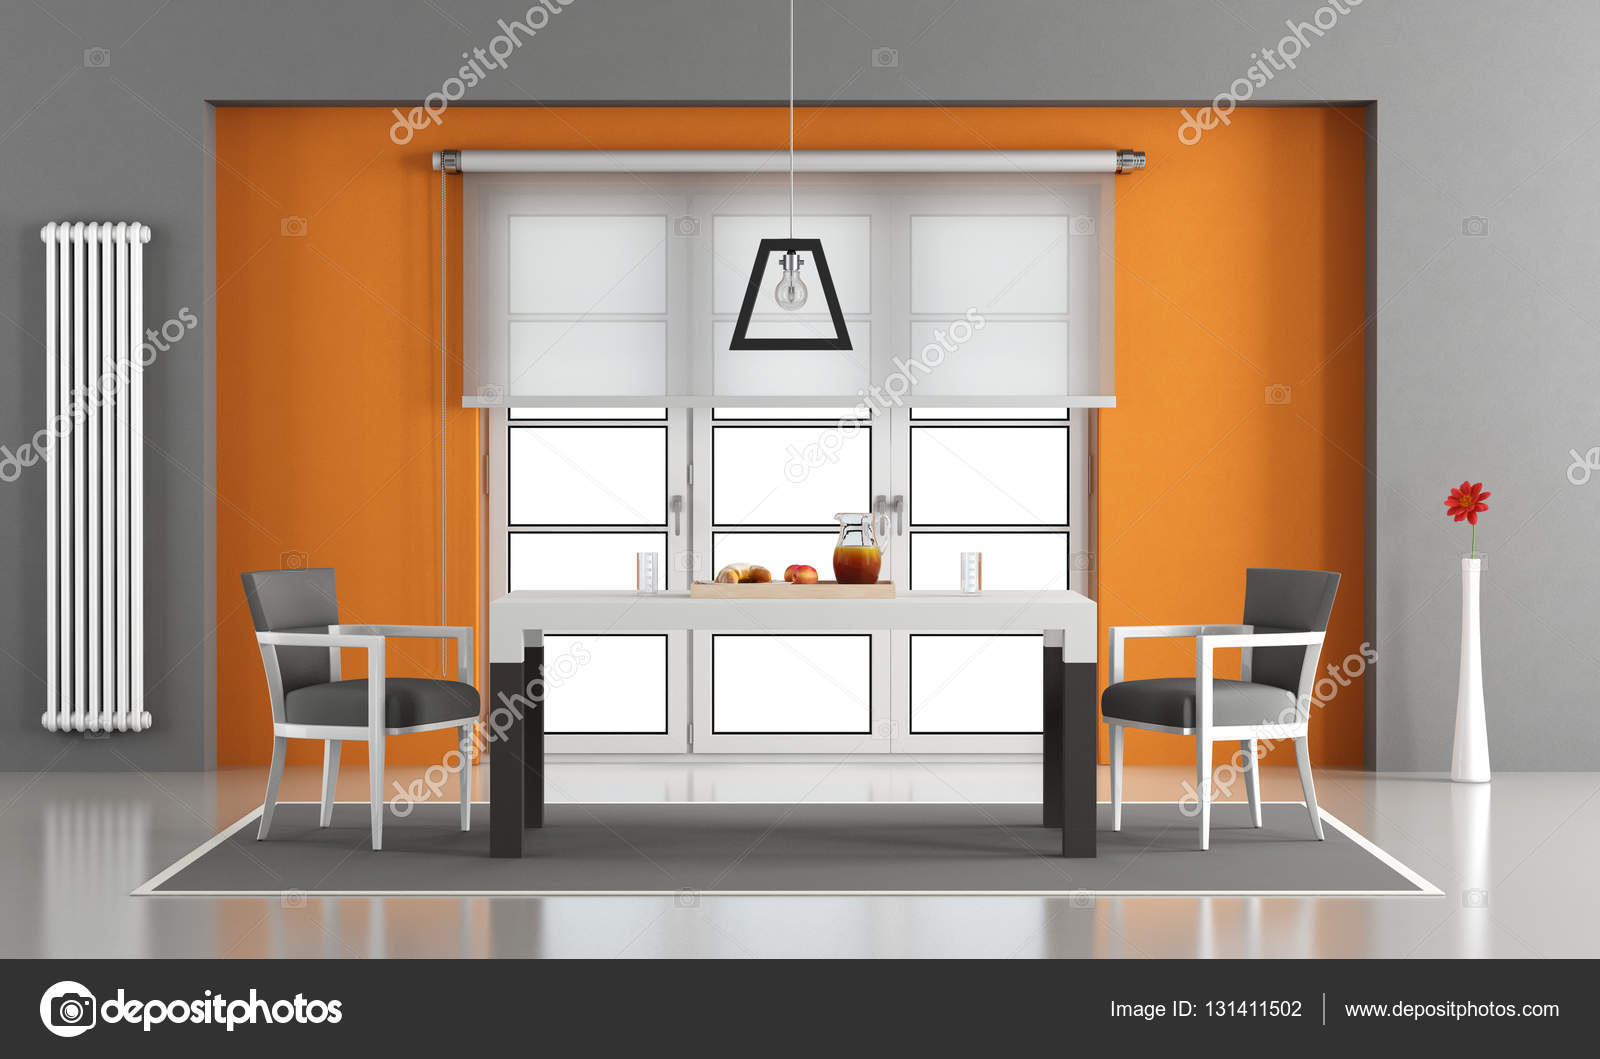 comedor contemporáneo — Fotos de Stock © archideaphoto #131411502